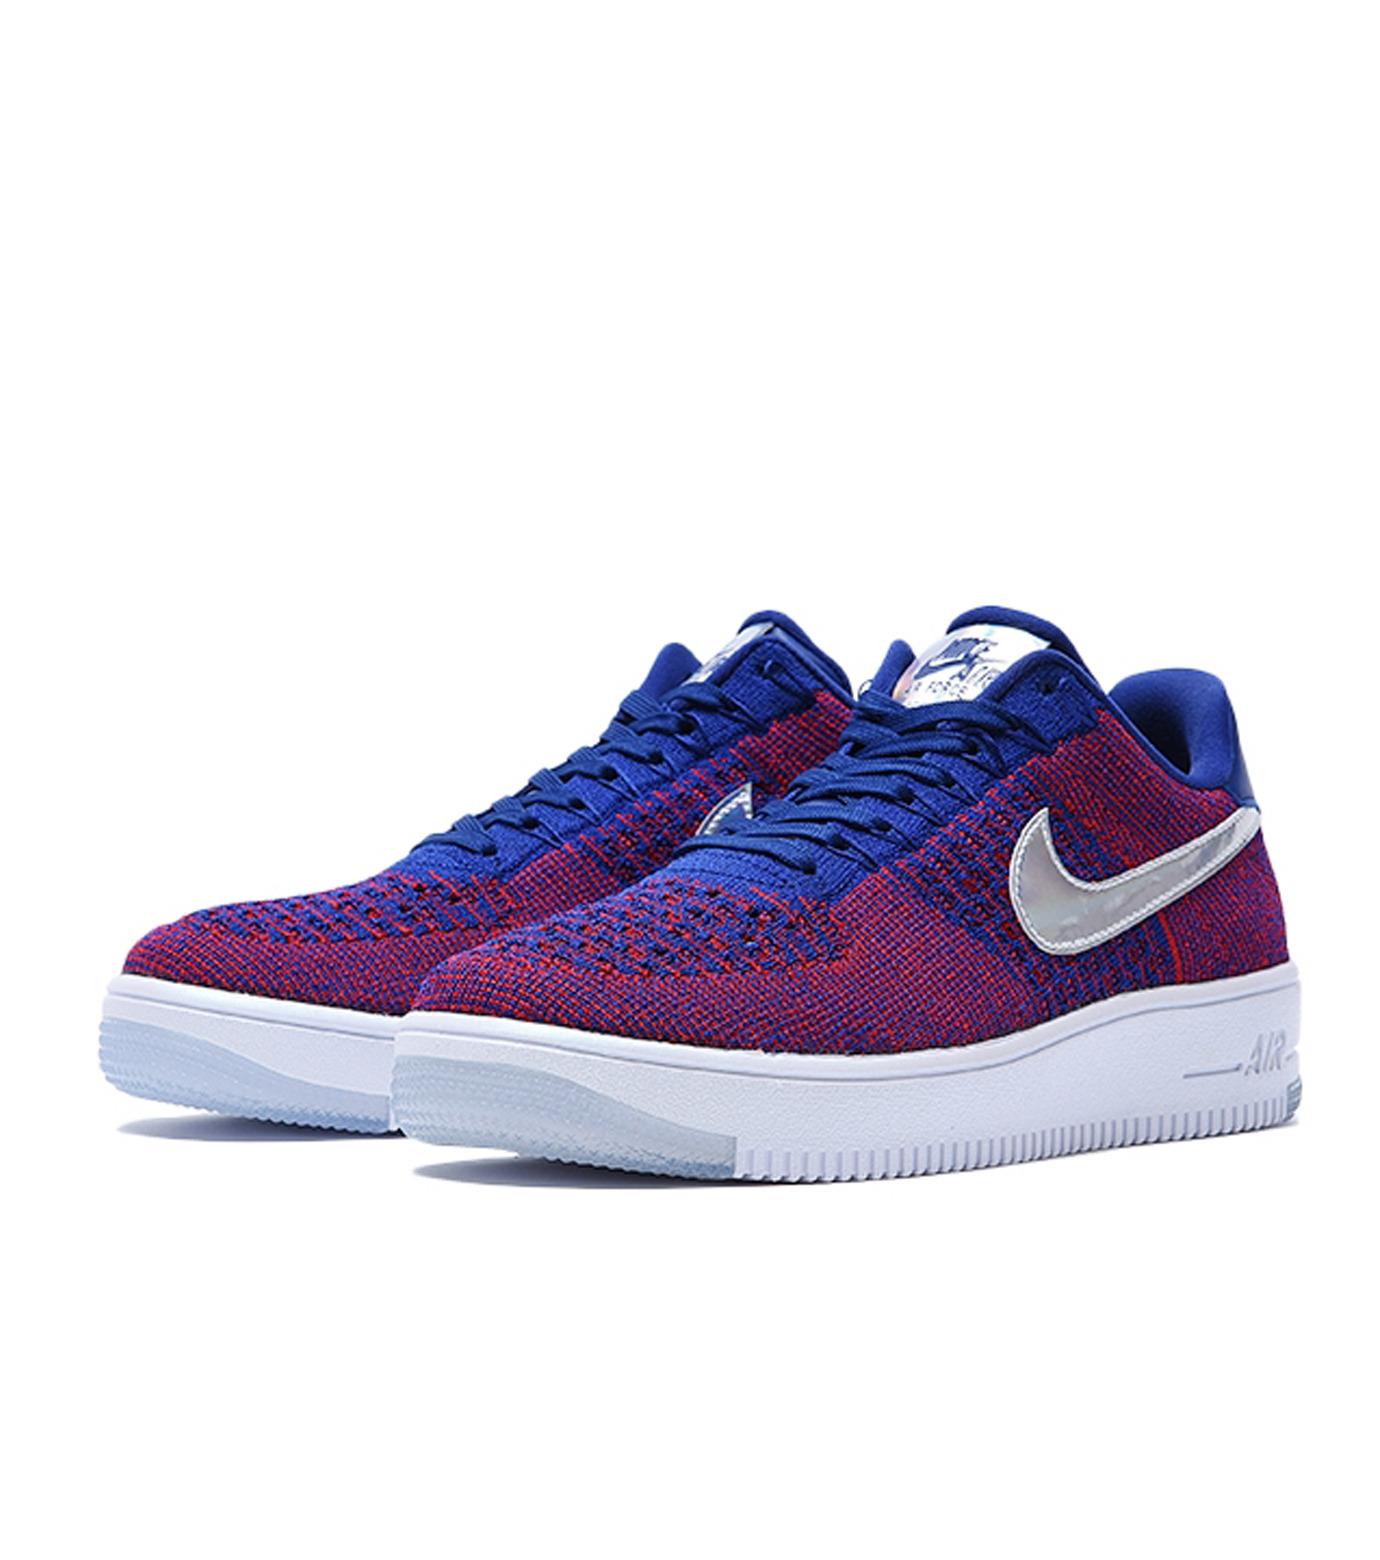 NIKE(ナイキ)のAF1 ULTRA FLYKNIT LOW PRM-BLUE(シューズ/shoes)-826577-601-92 拡大詳細画像3